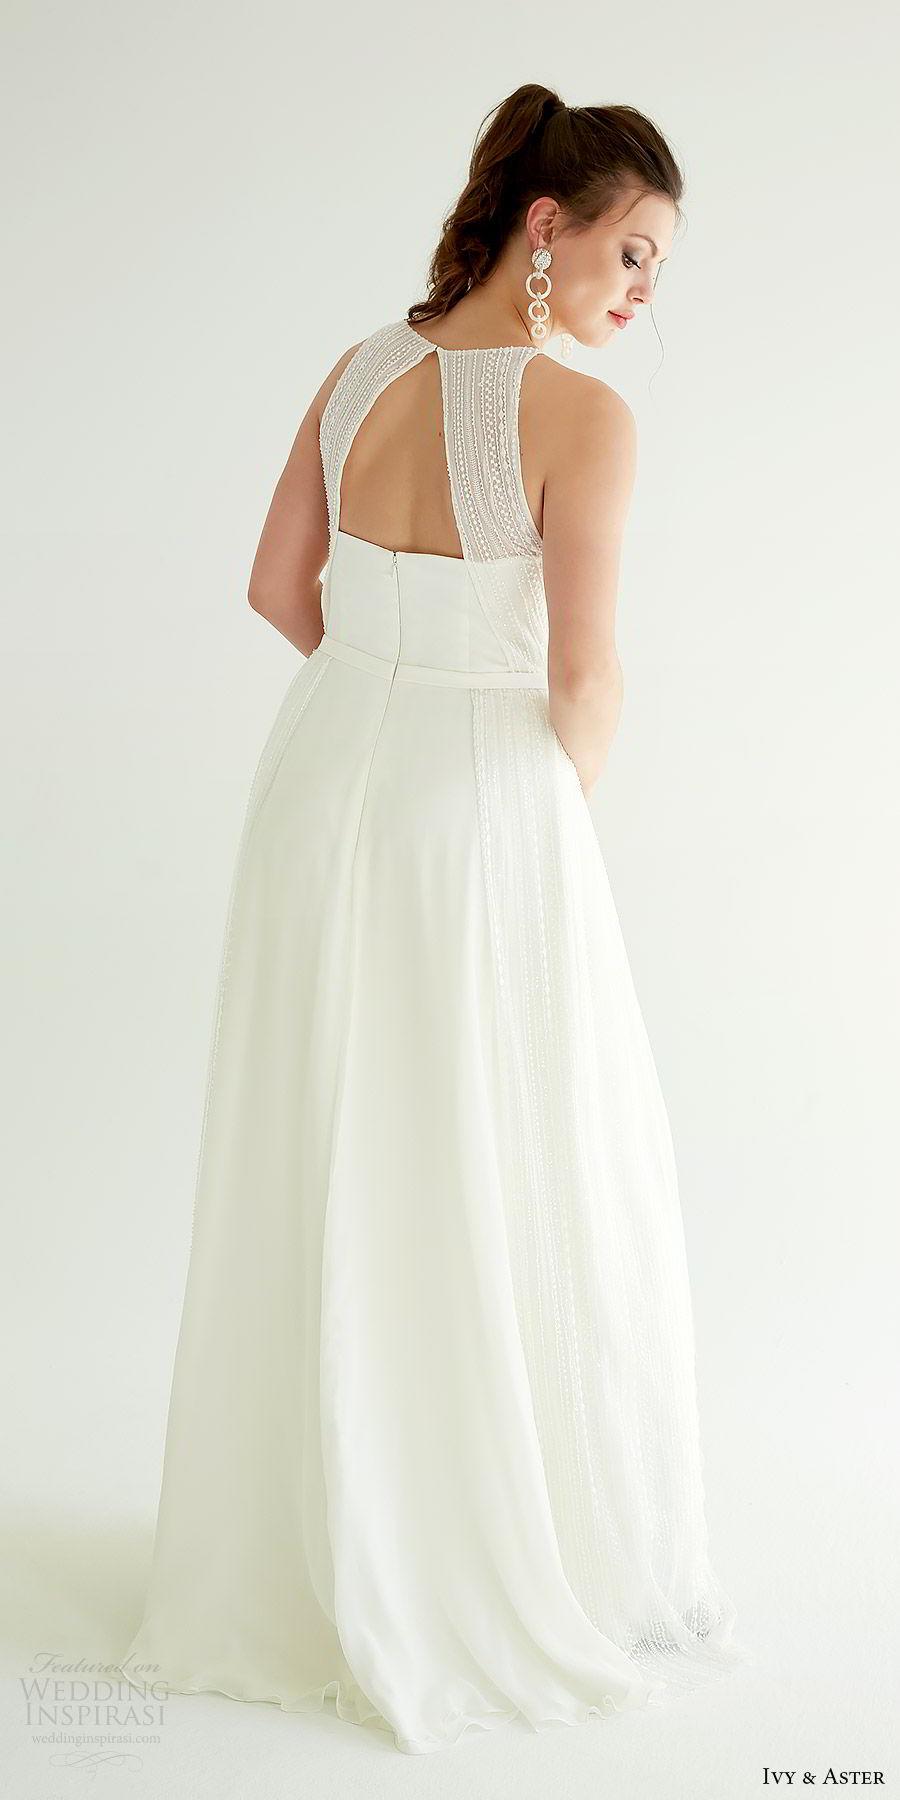 ivy aster bridal 2019 sleeveless jewel neck bib slit skirt minimal a line wedding dress (sophia) bv cutout back modern chic